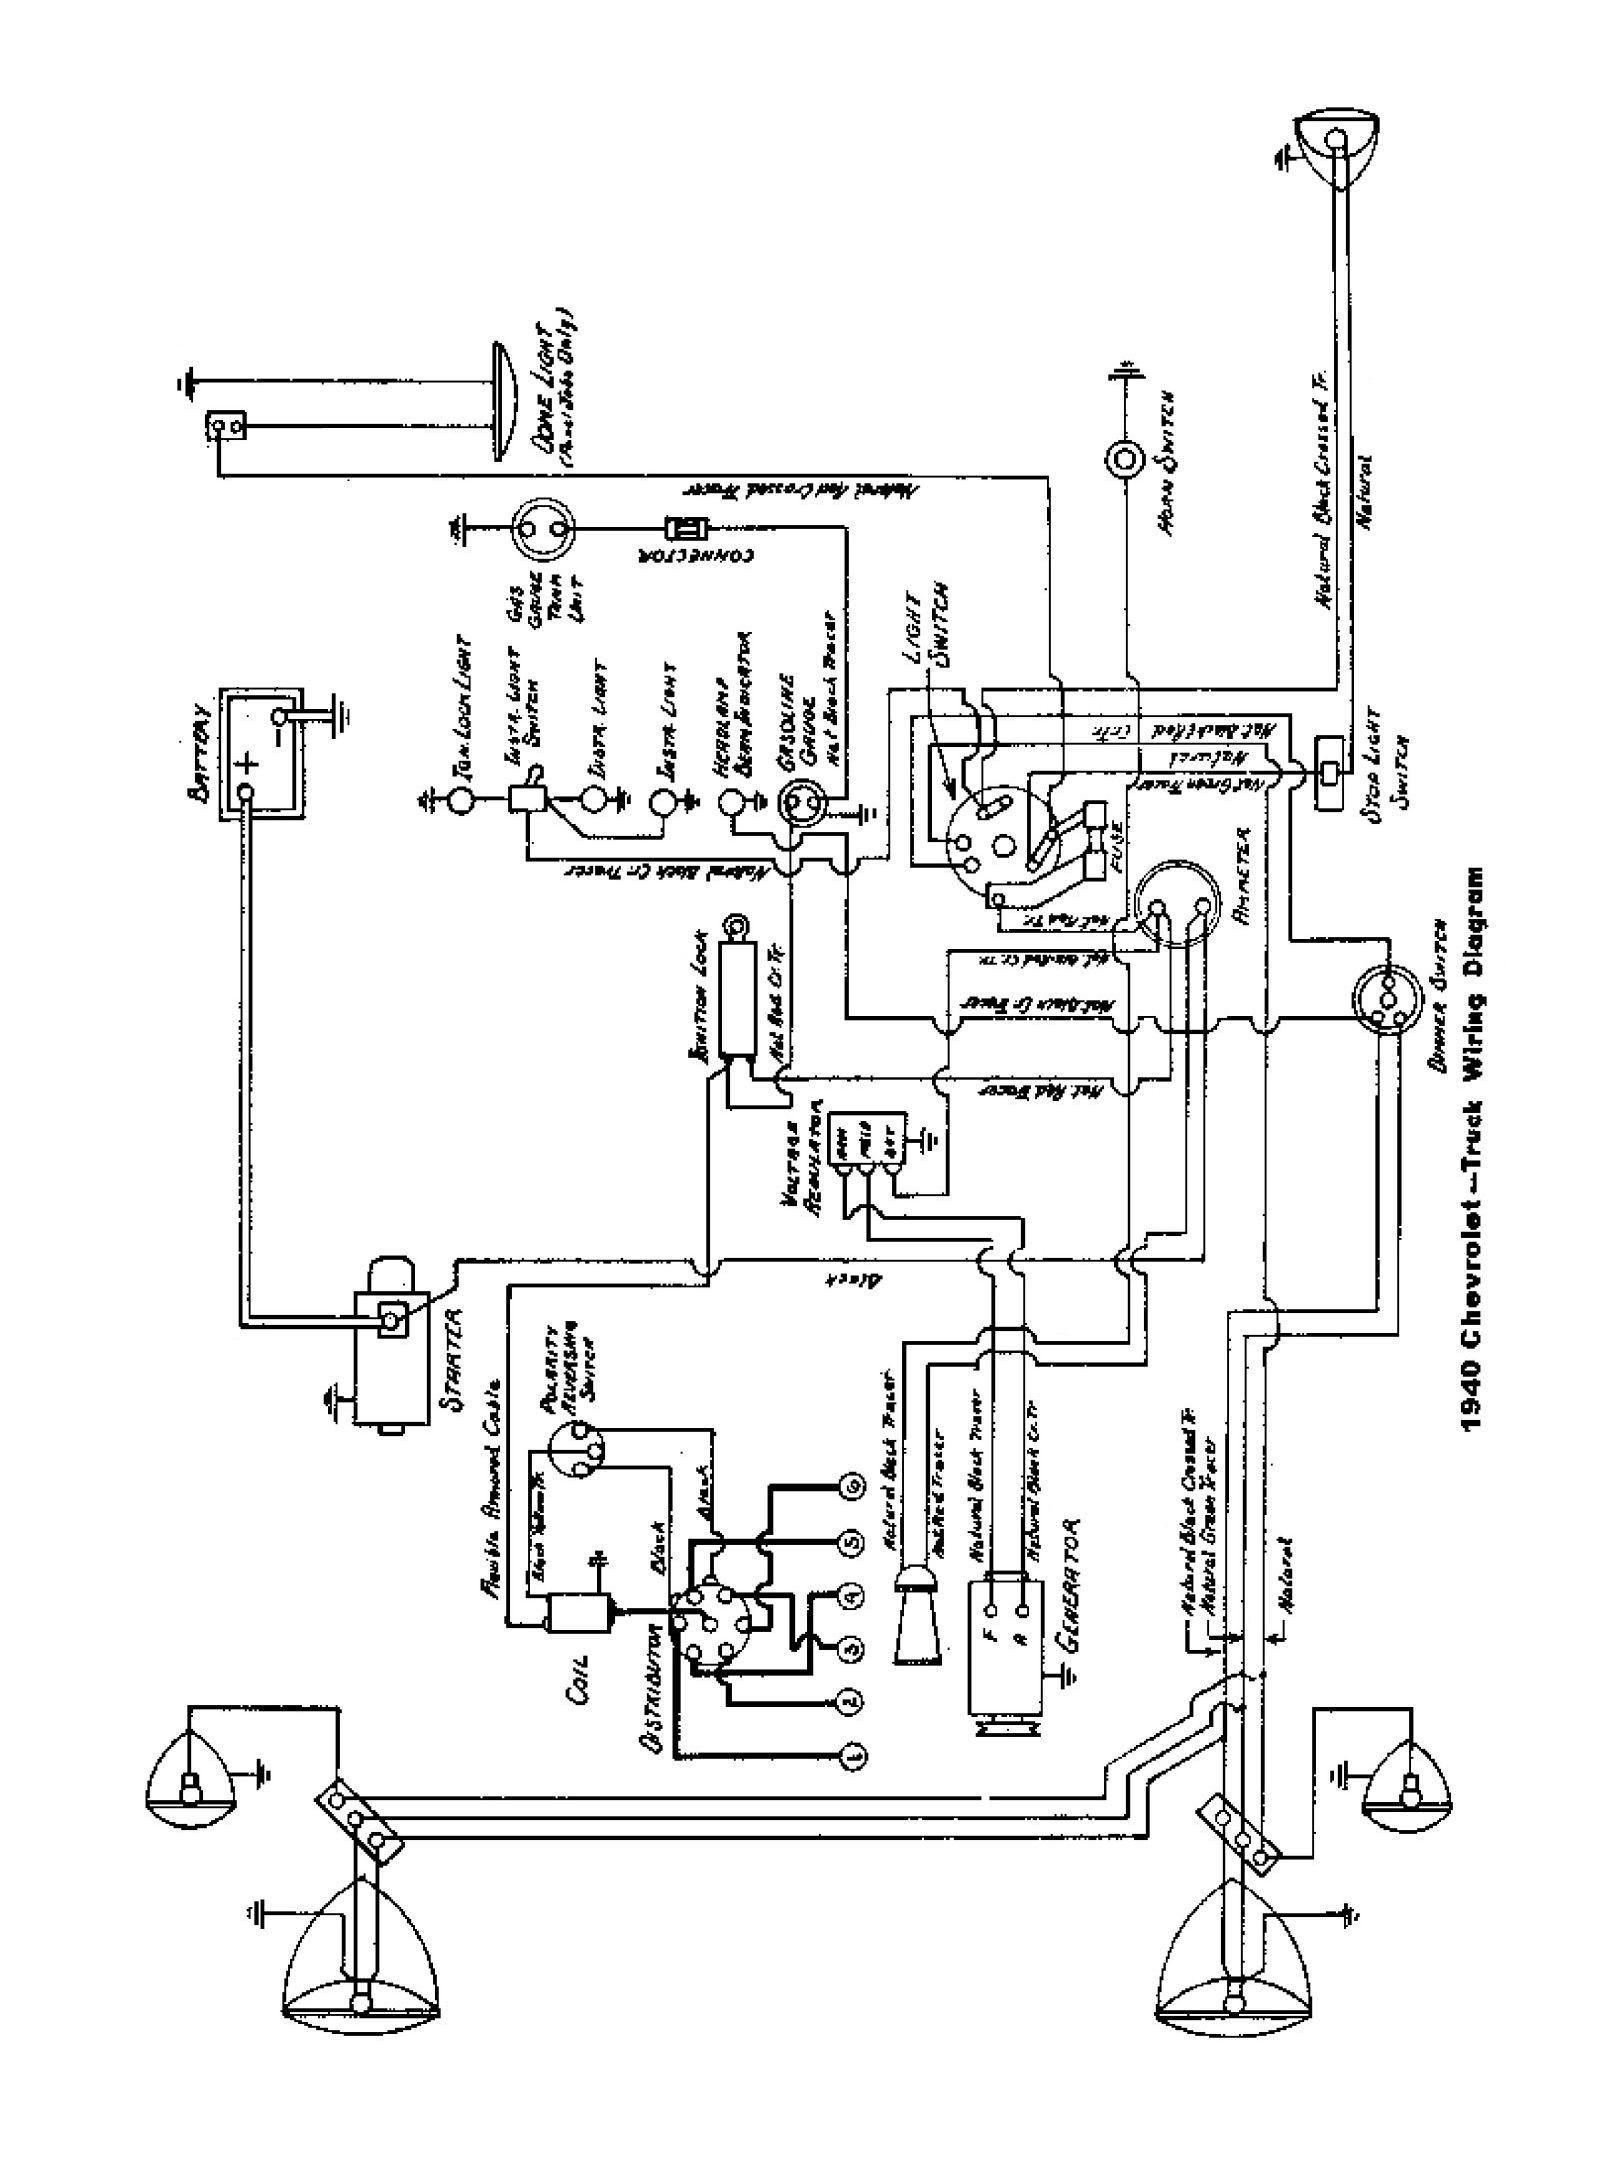 1976 Chevy Truck Wiring Diagram In 2021 57 Chevy Trucks Chevy Trucks Electrical Diagram